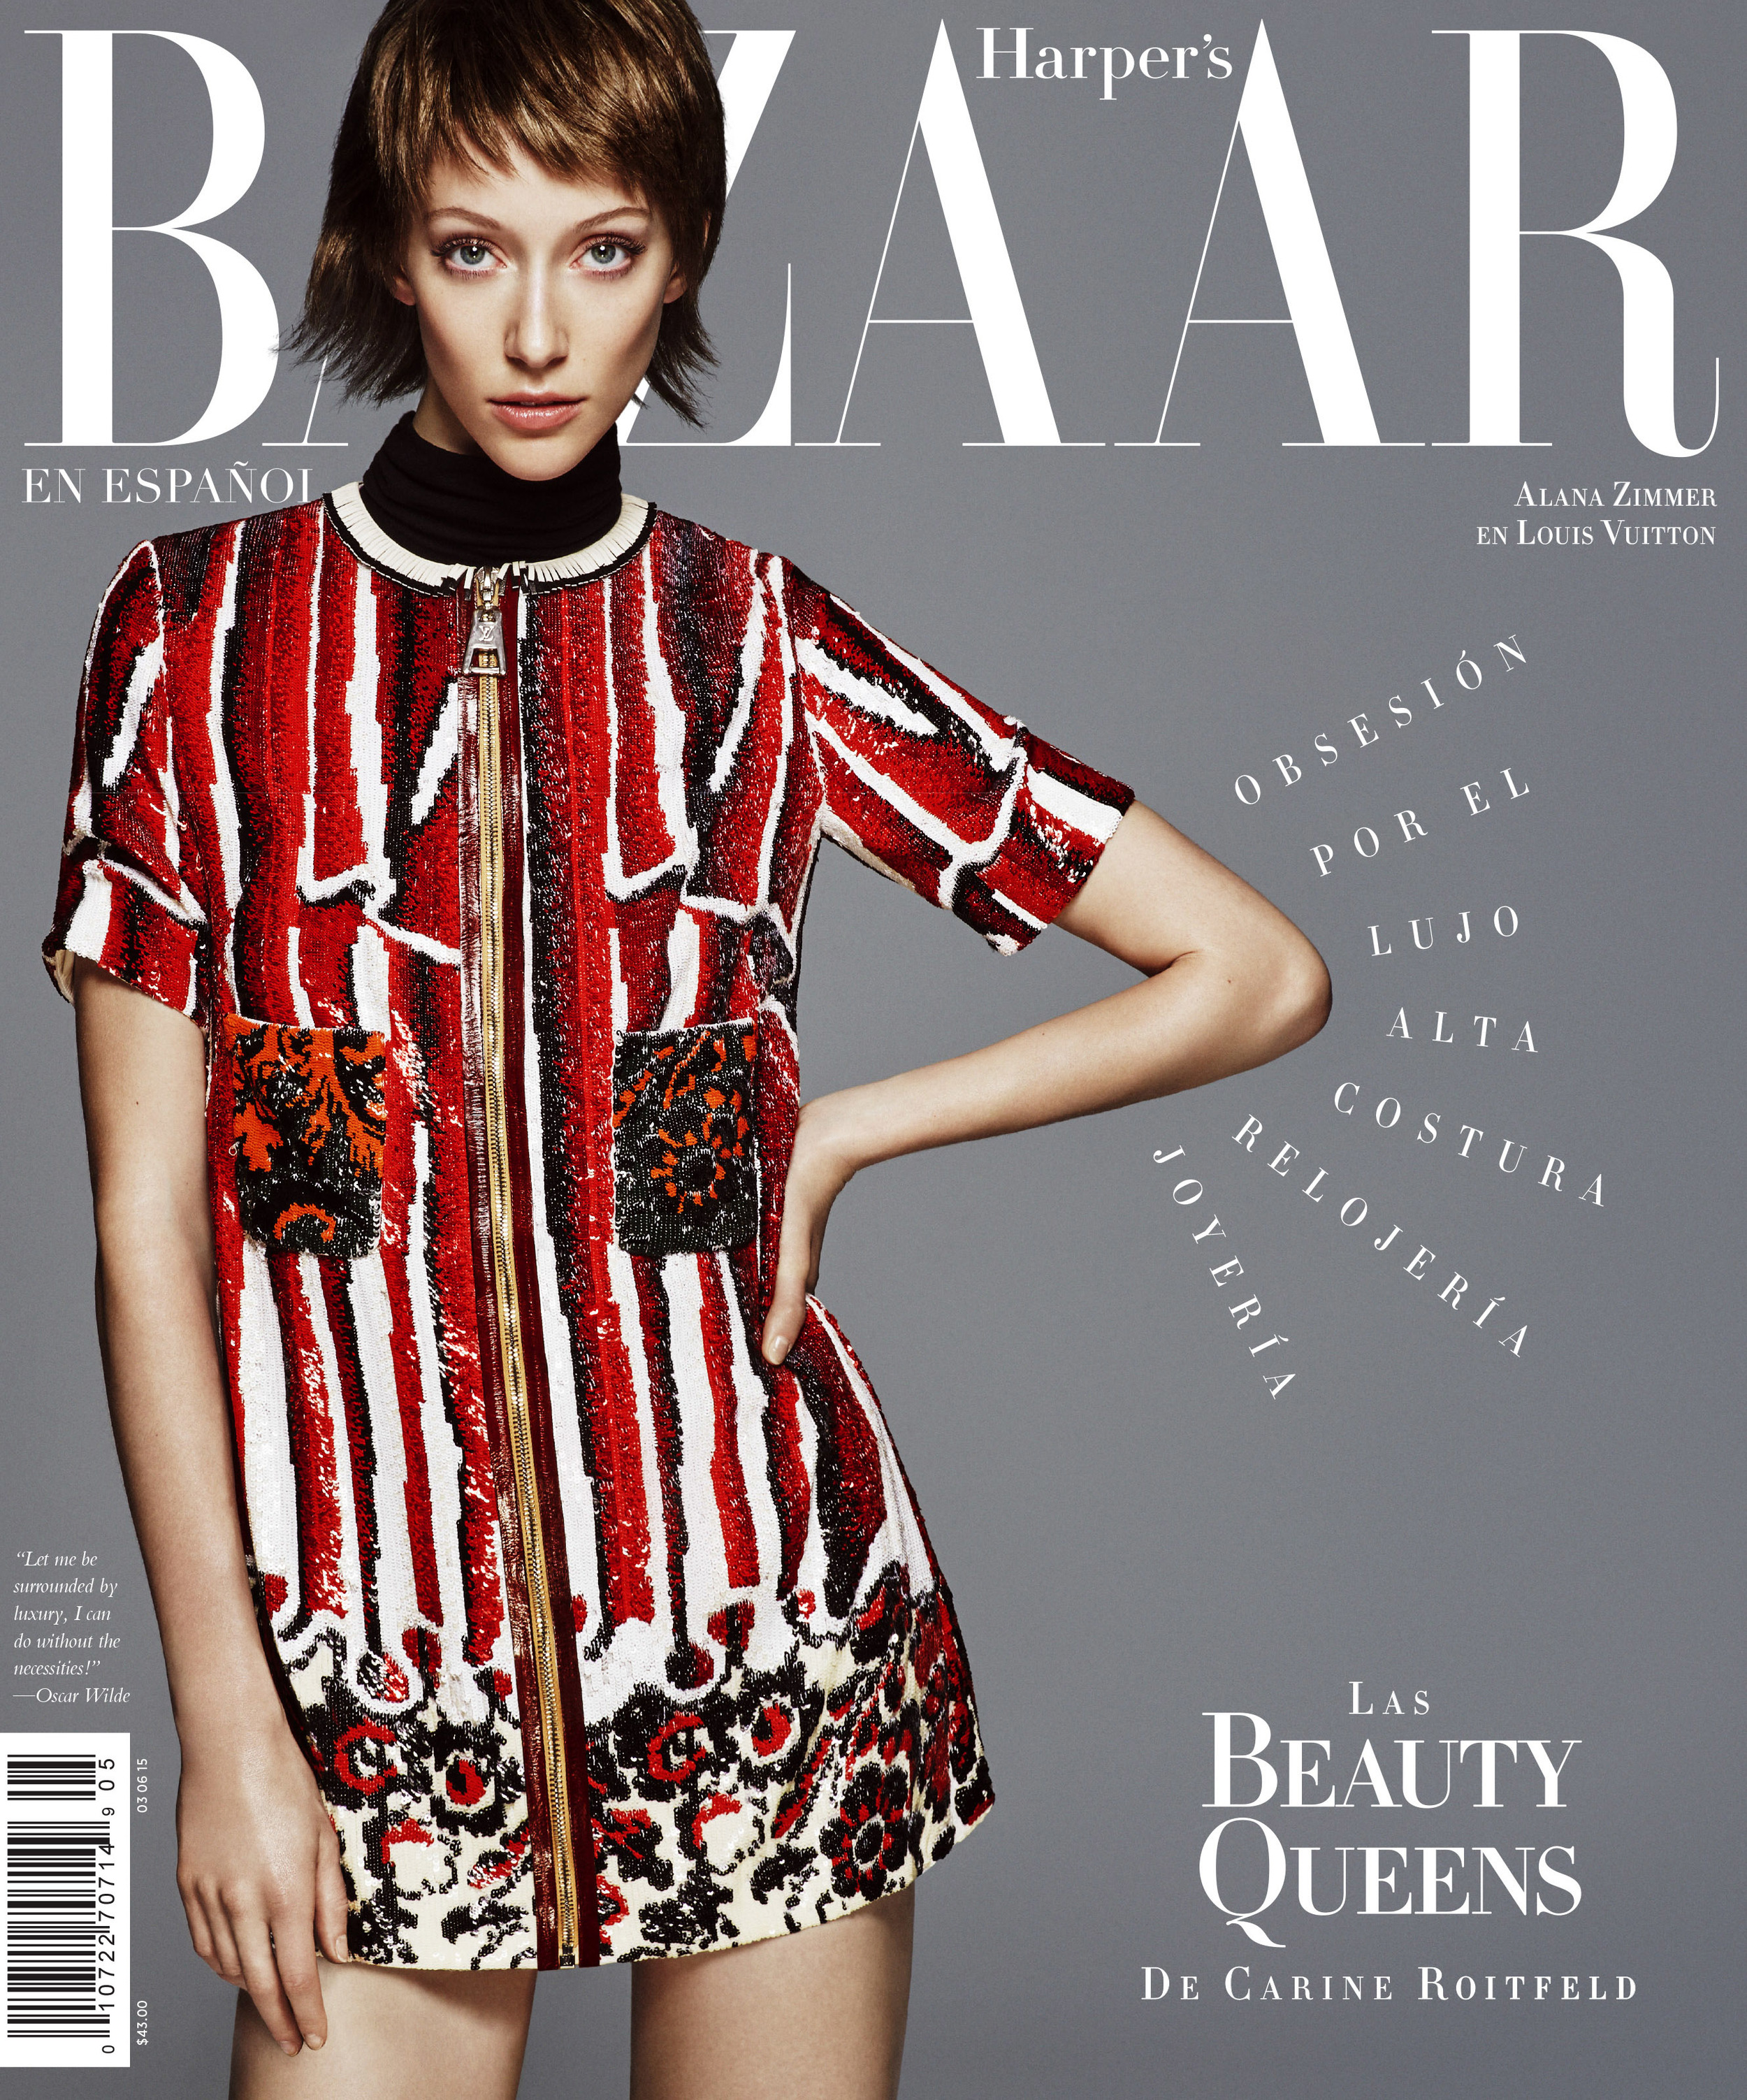 Alana Bazaar Cover.jpg